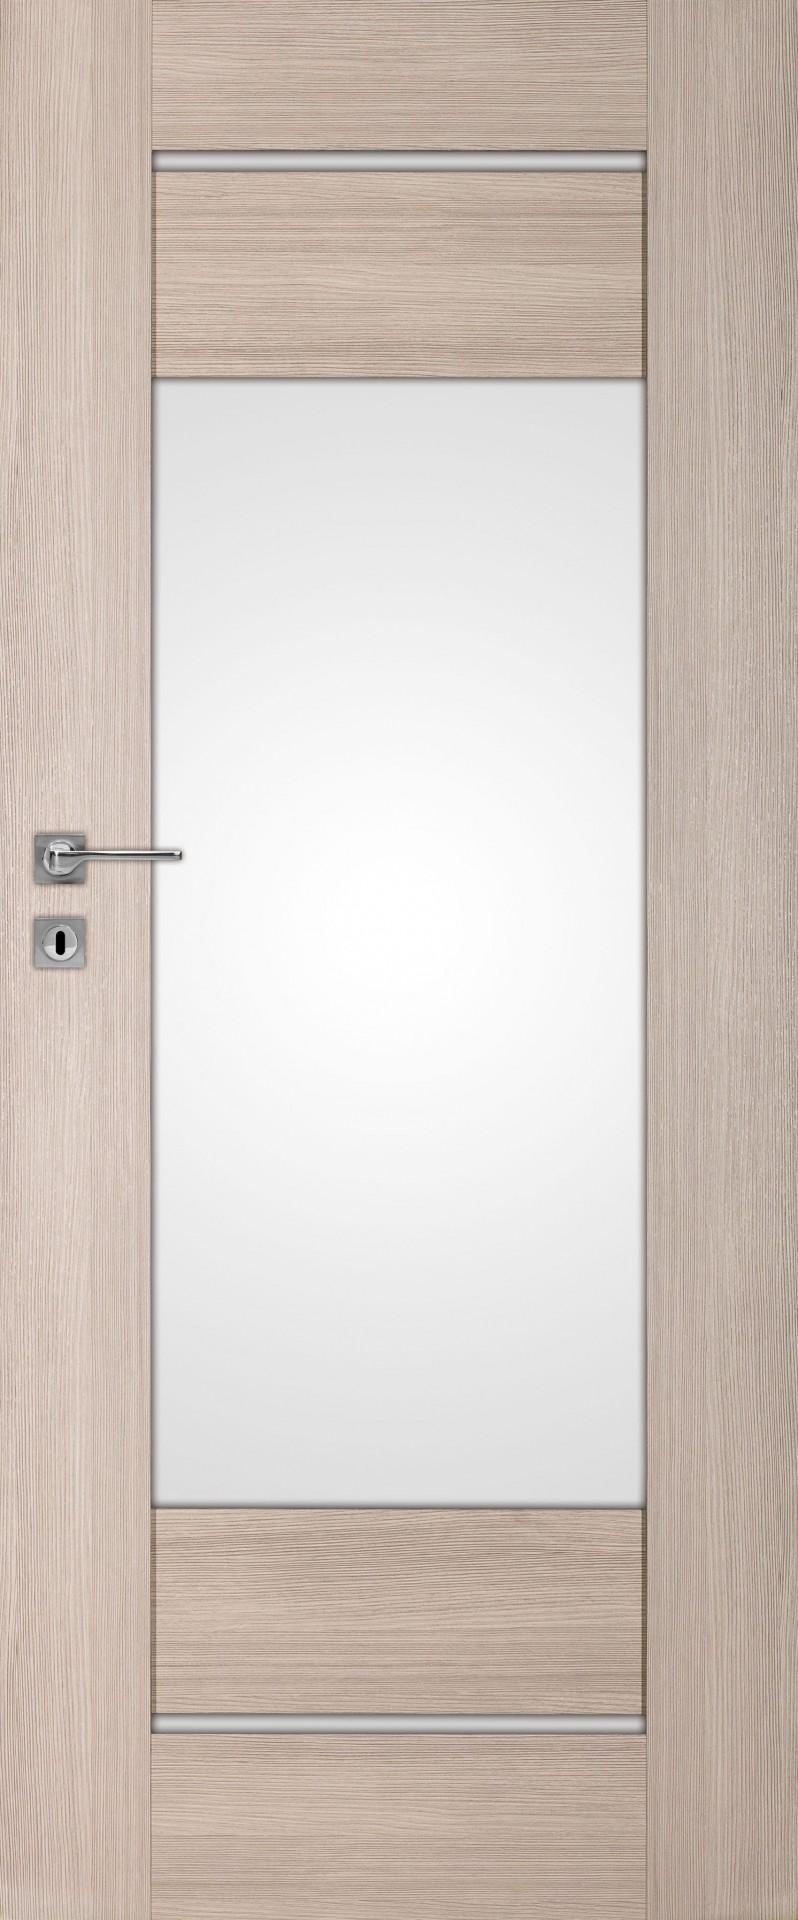 Dre dveře PREMIUM 3, Šíře v cm 60